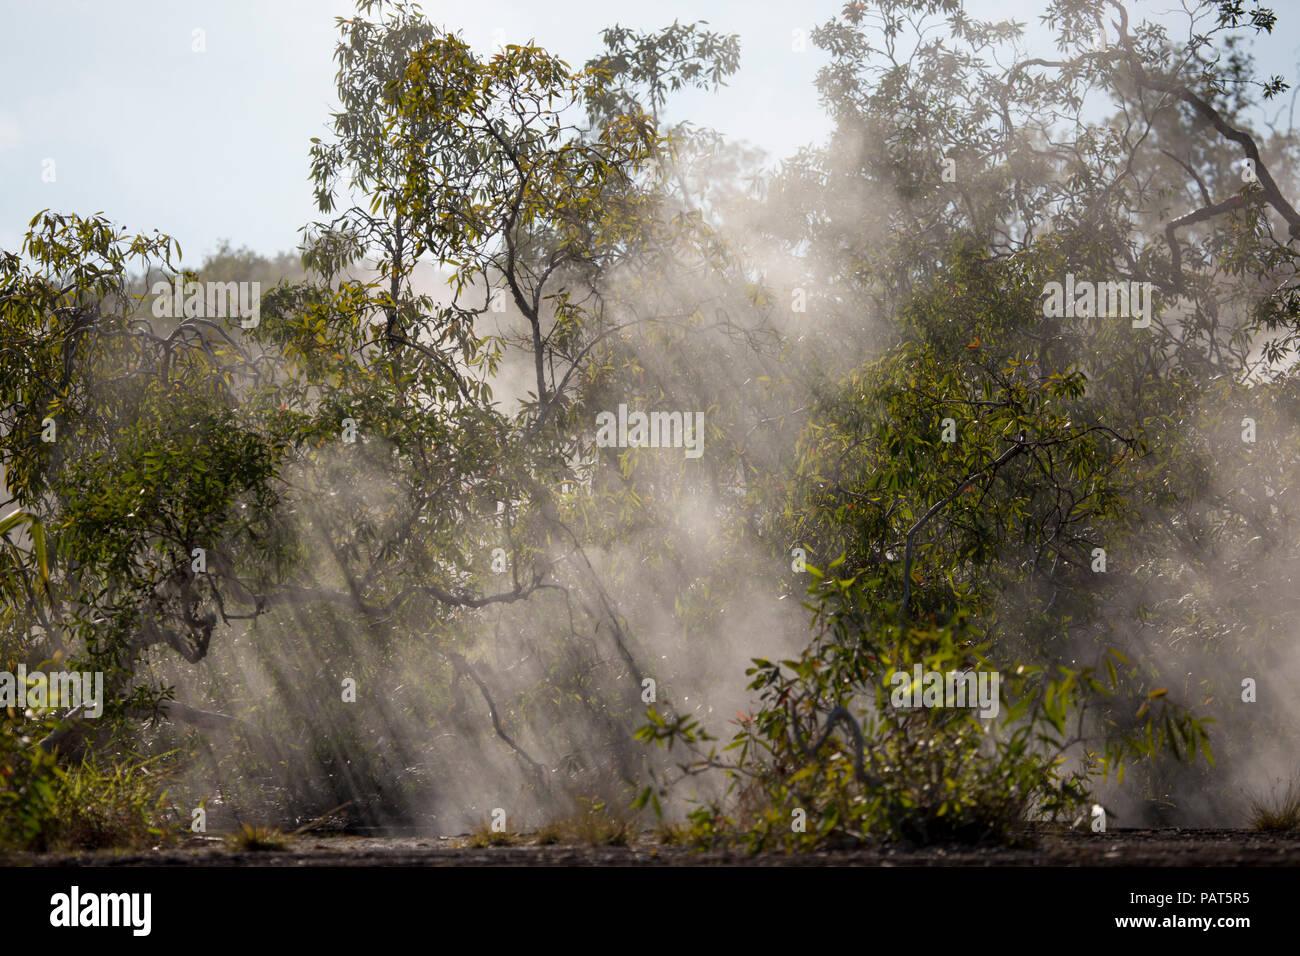 Papua New Guinea, Dei Dei Hot Springs, Fergusson Island. Steam rising through trees from hot spring. - Stock Image